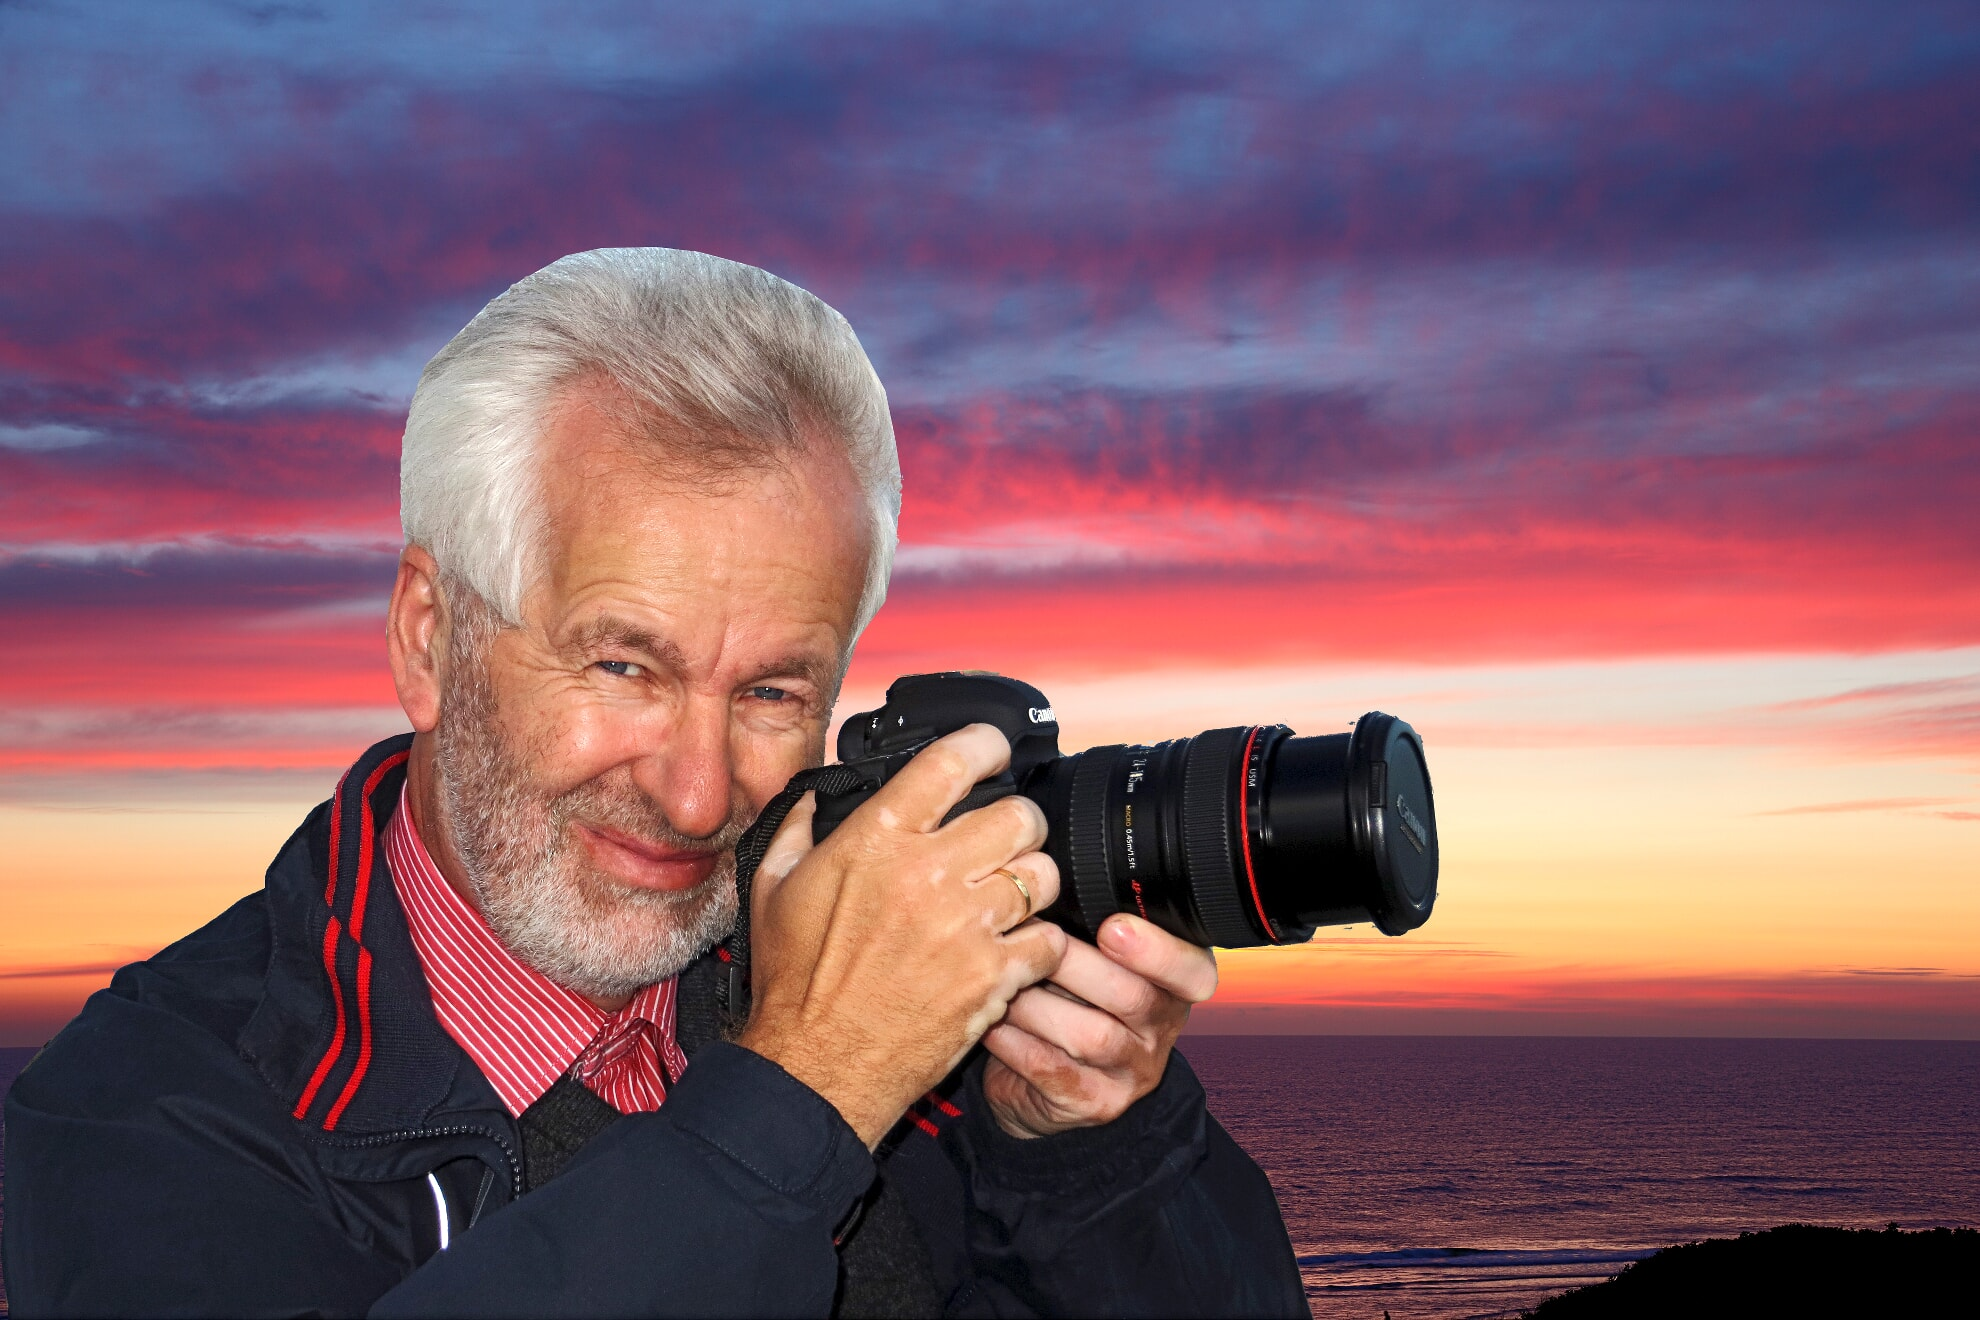 Fotospaziergang mit Reinhardt Albers